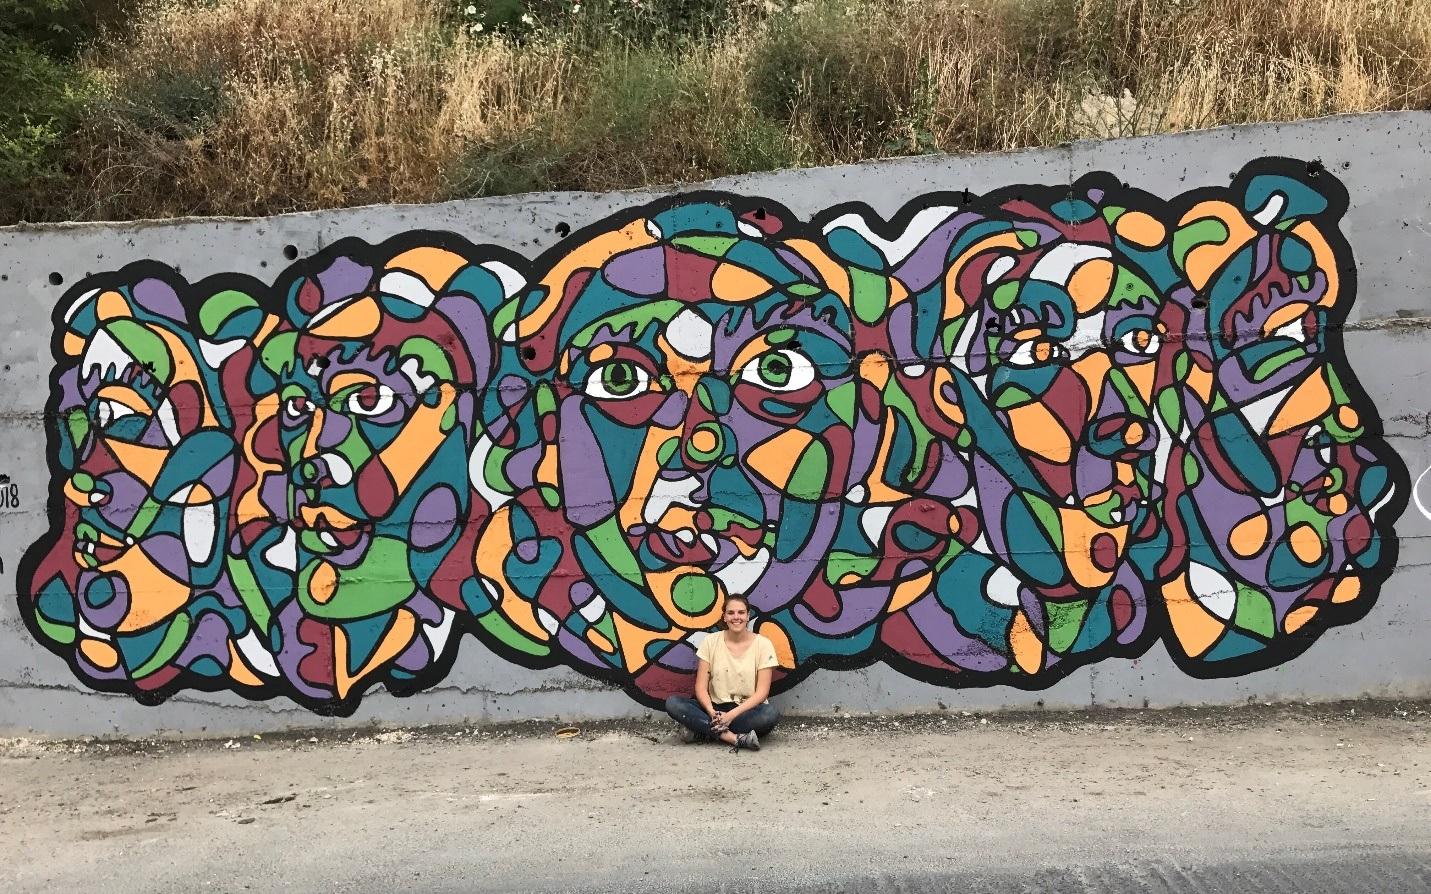 Phoebe Mural